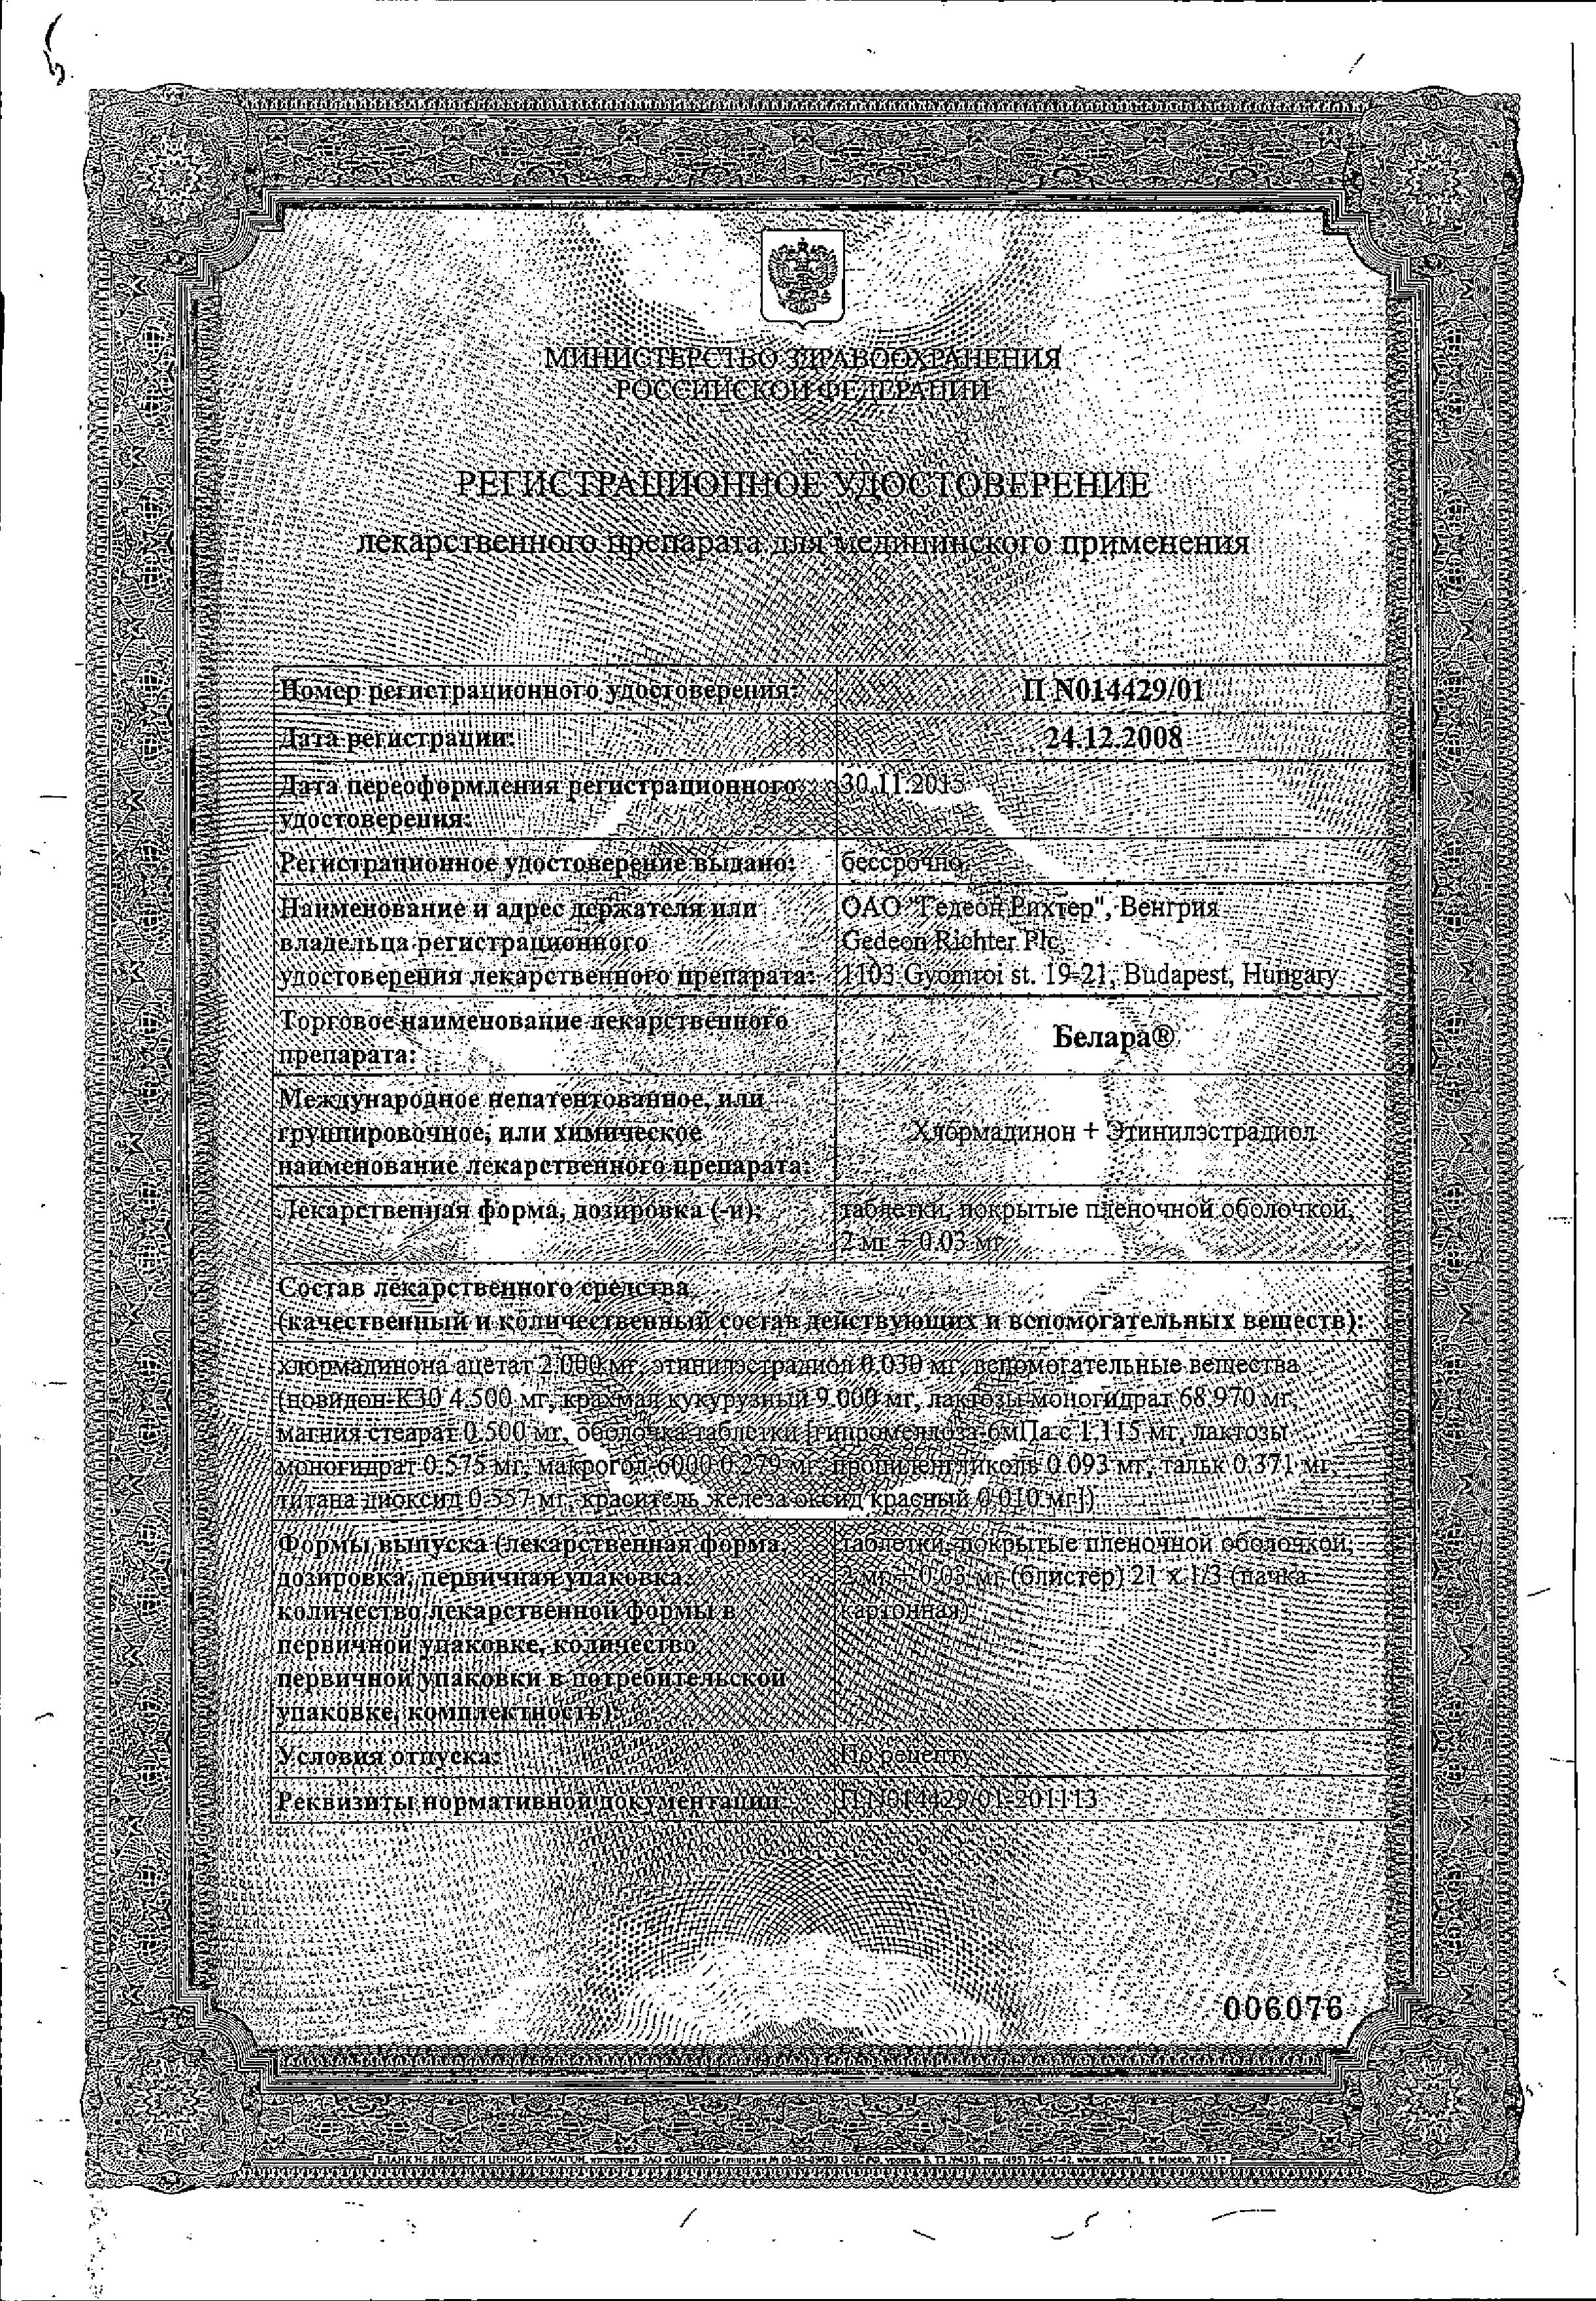 Белара сертификат